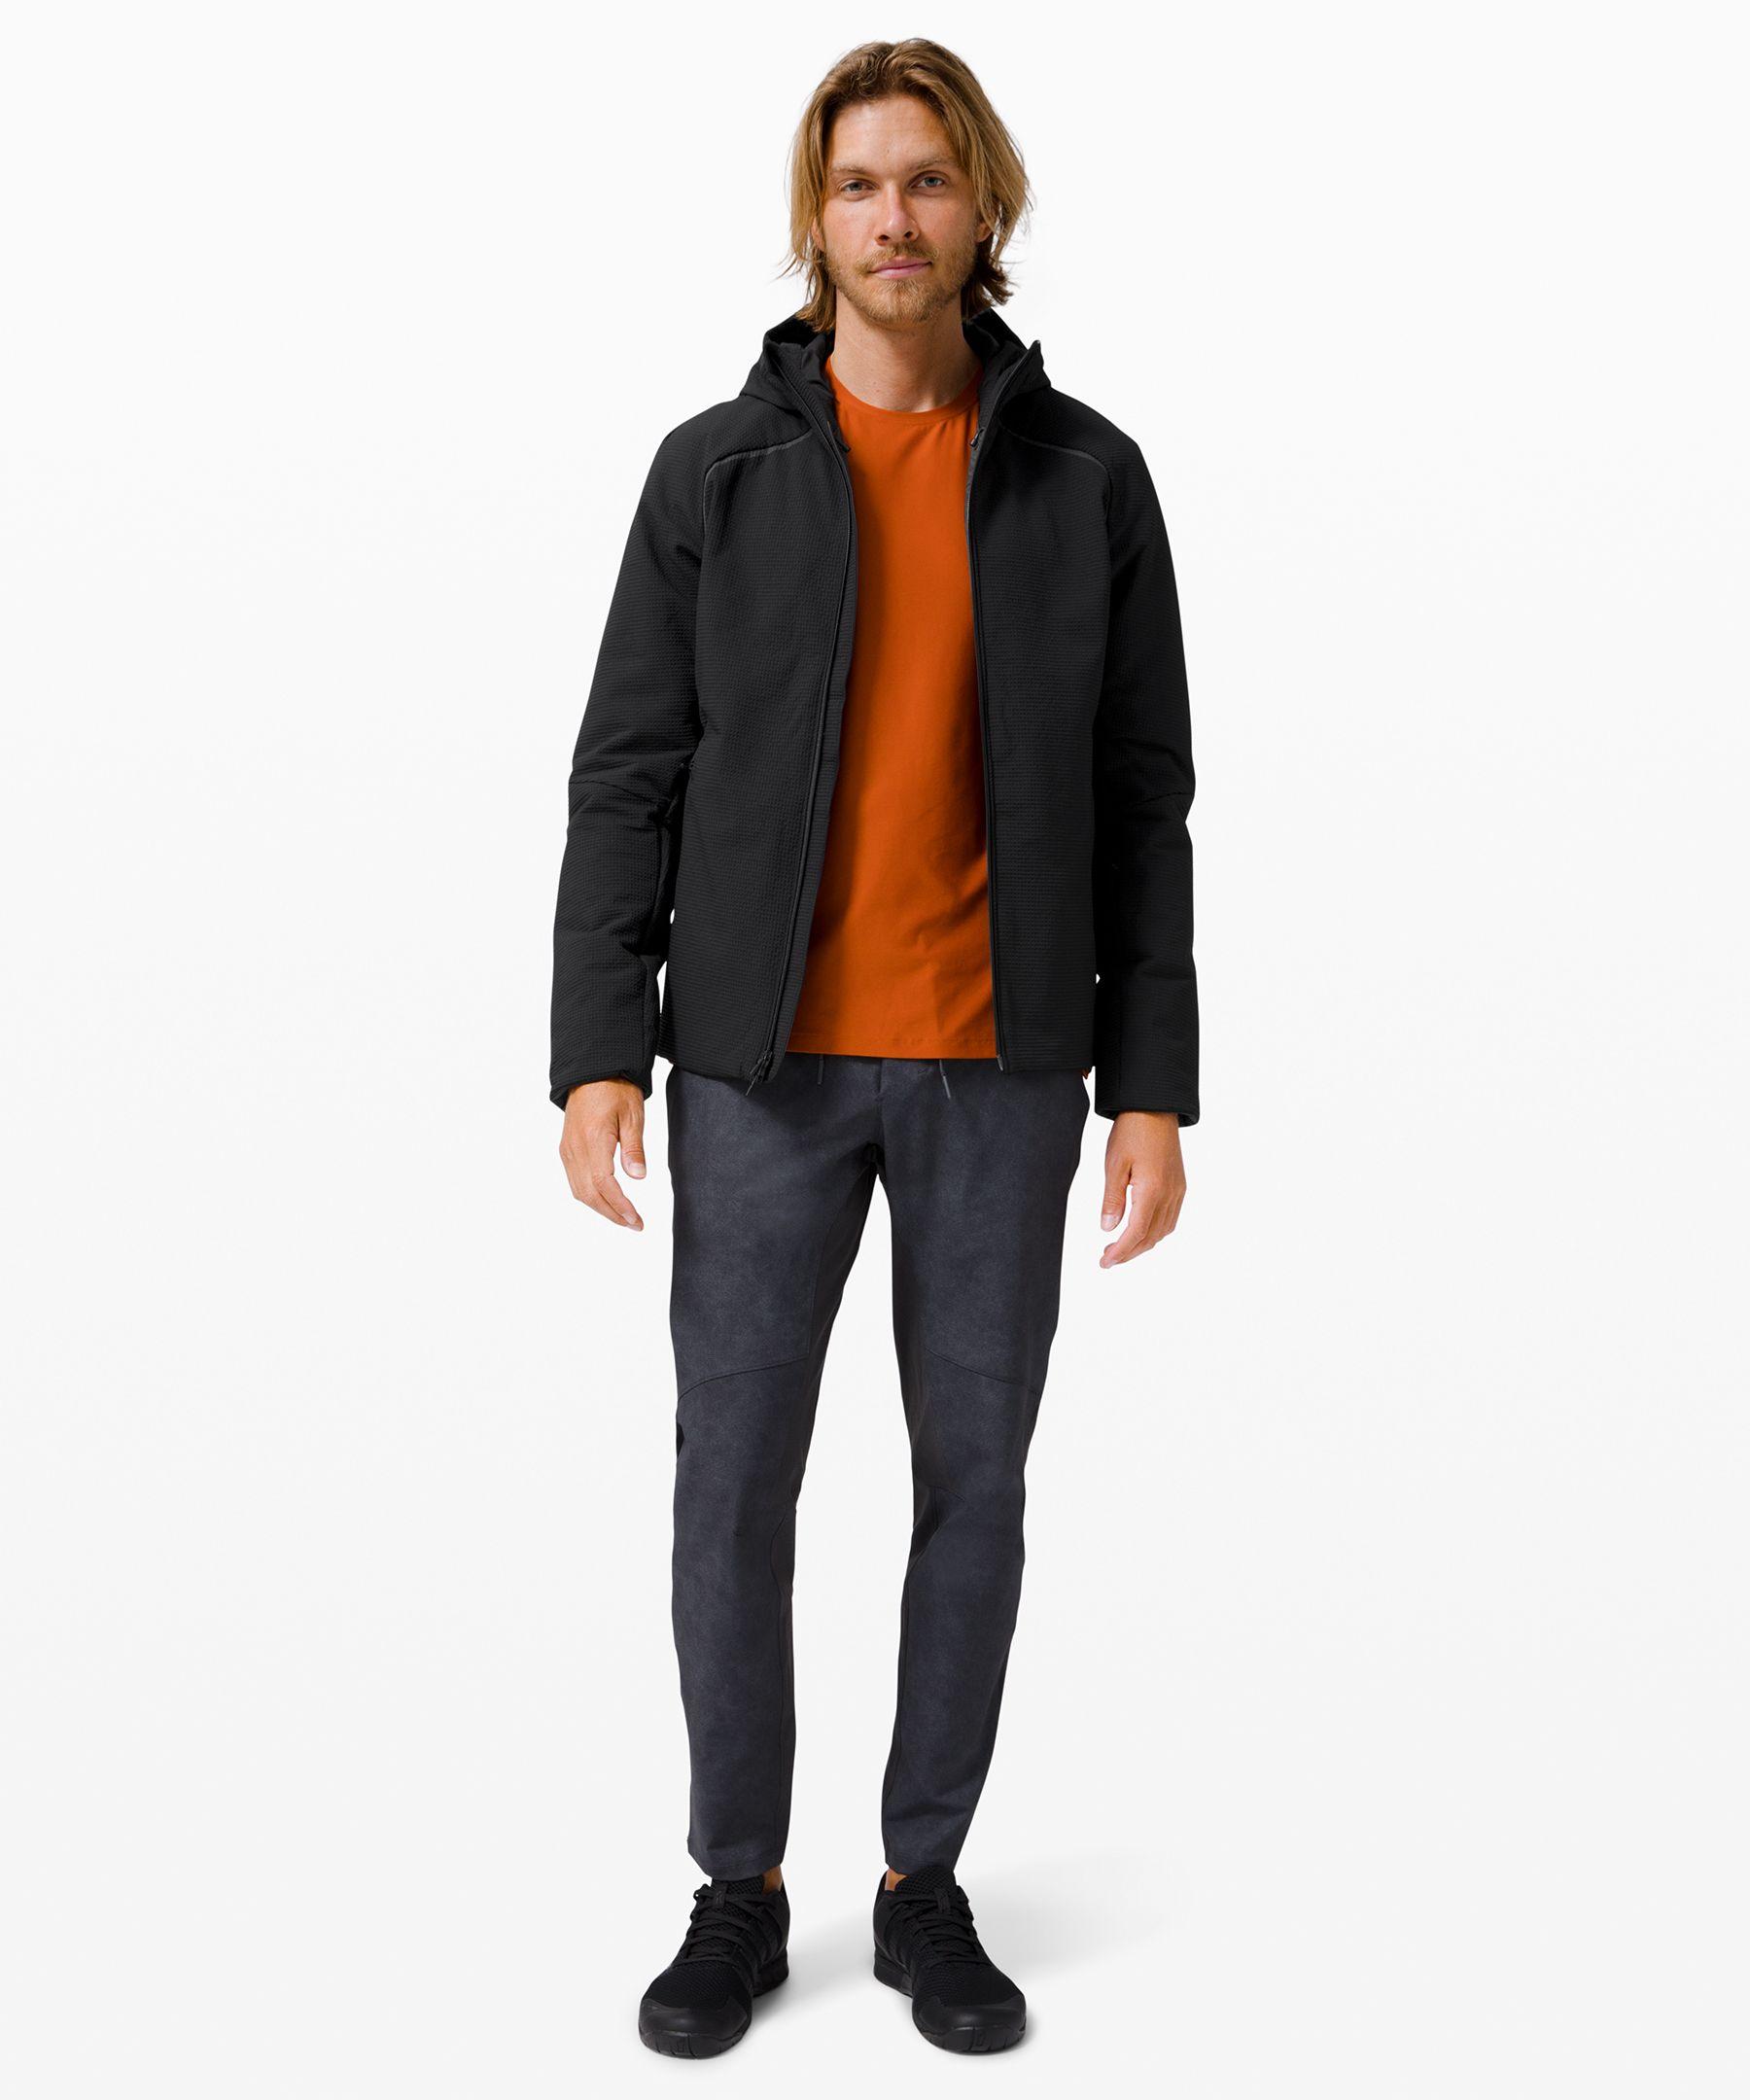 Lululemon Texture Tech Jacket